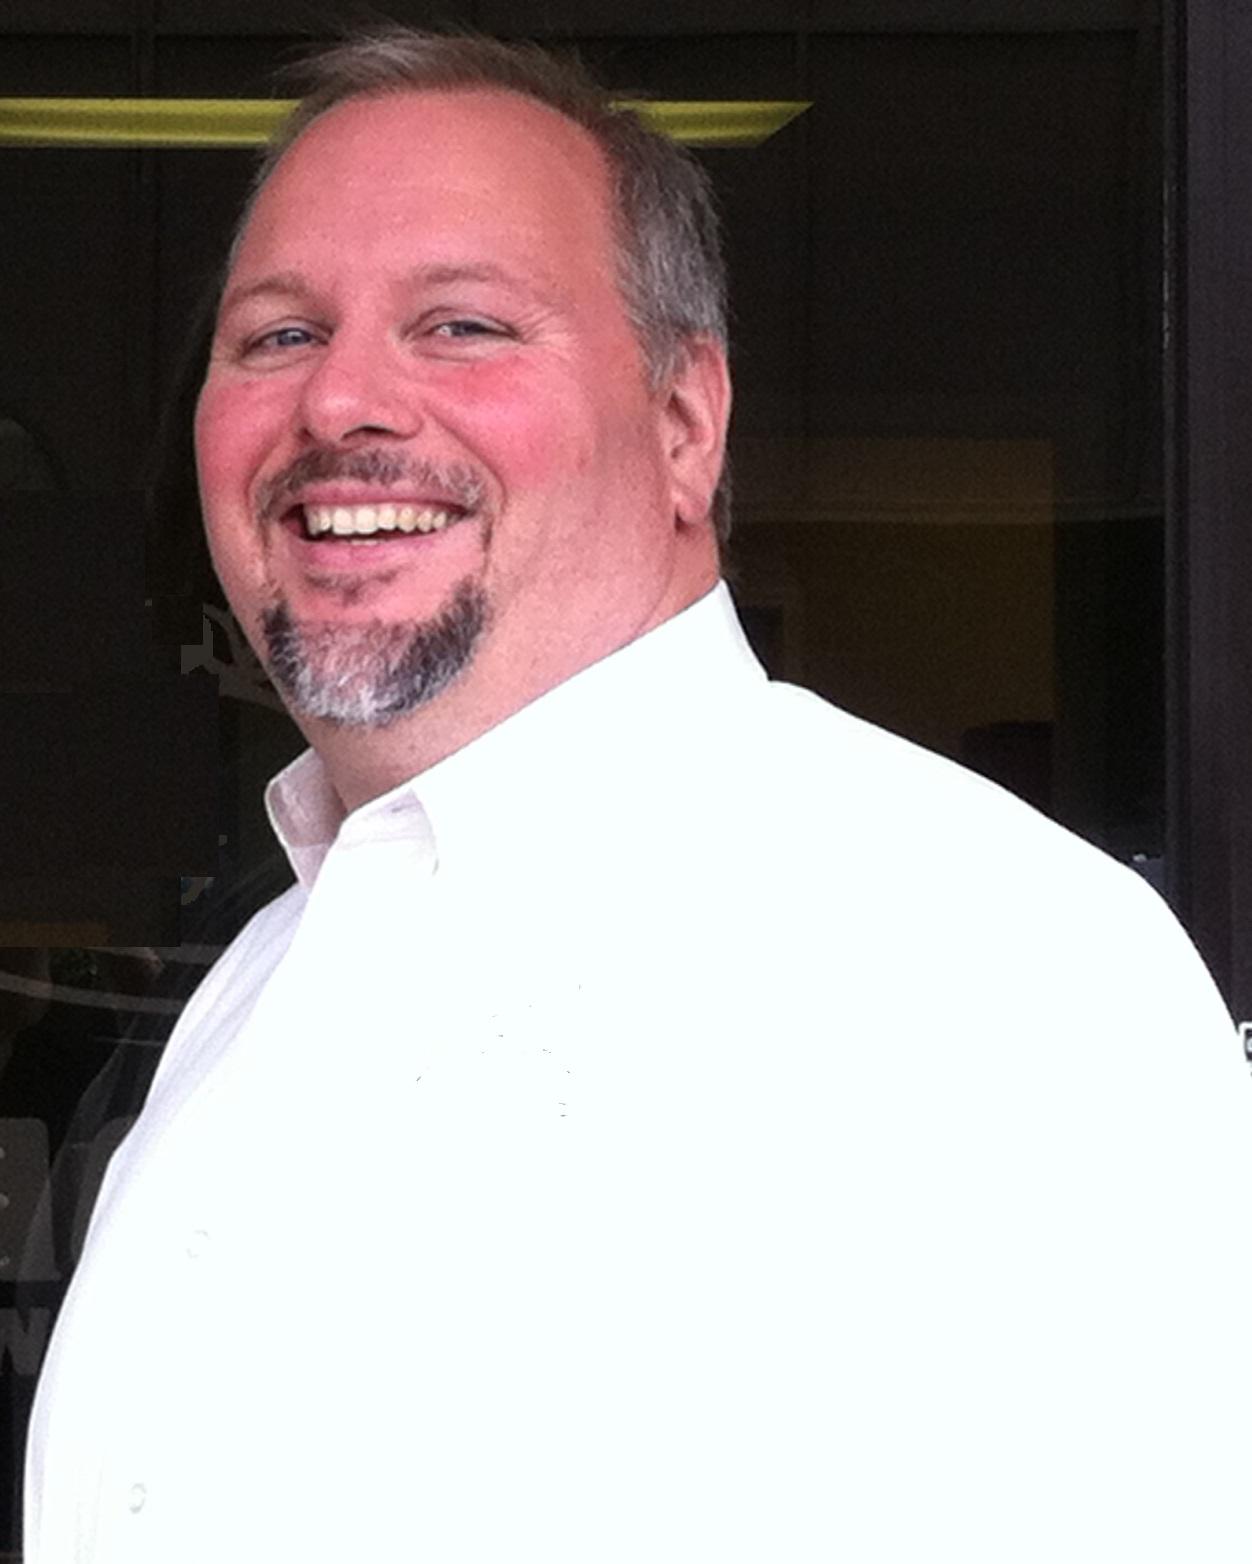 David Ogden, CEO